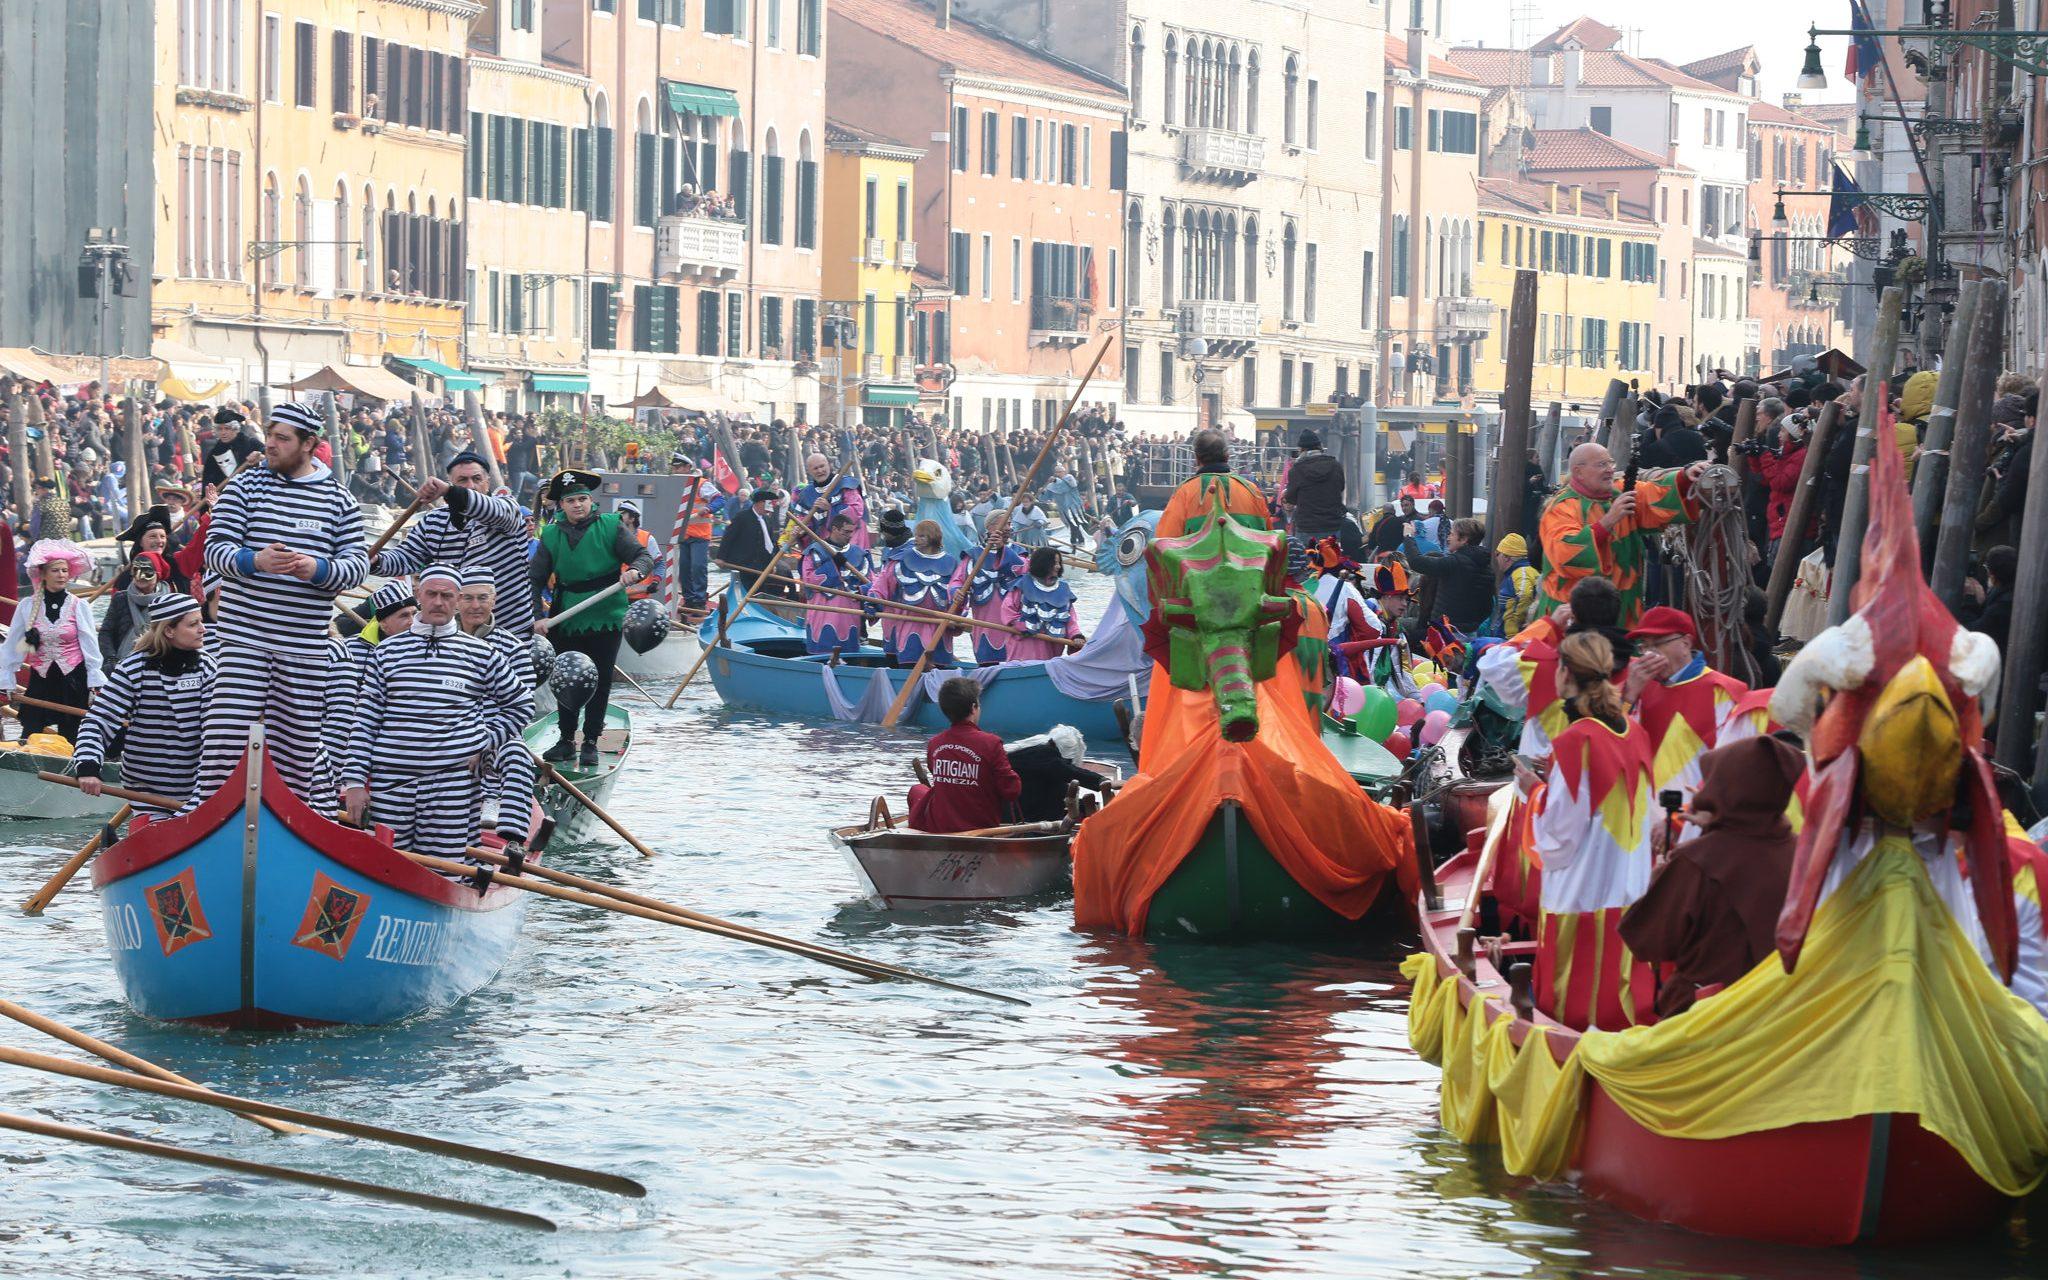 Royal carnevale di venezia